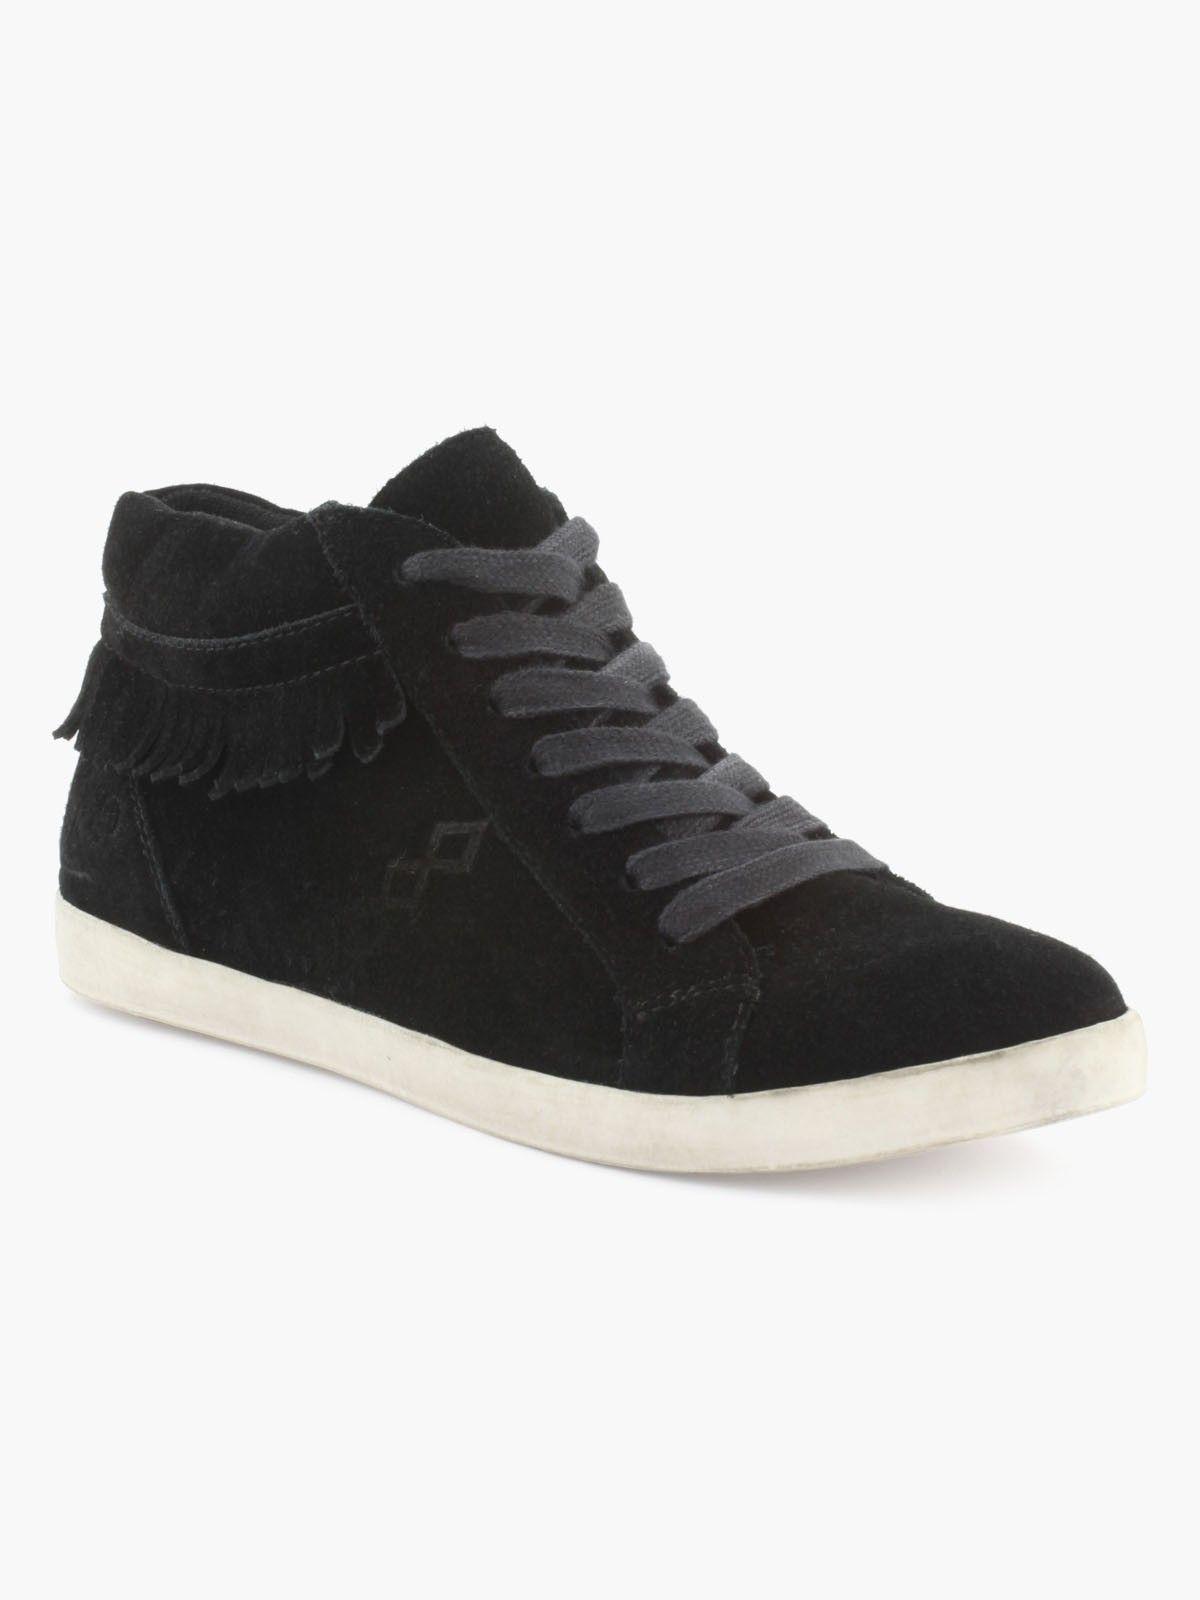 CHAUSSURES A LACETS | Lacets chaussures, Chaussure